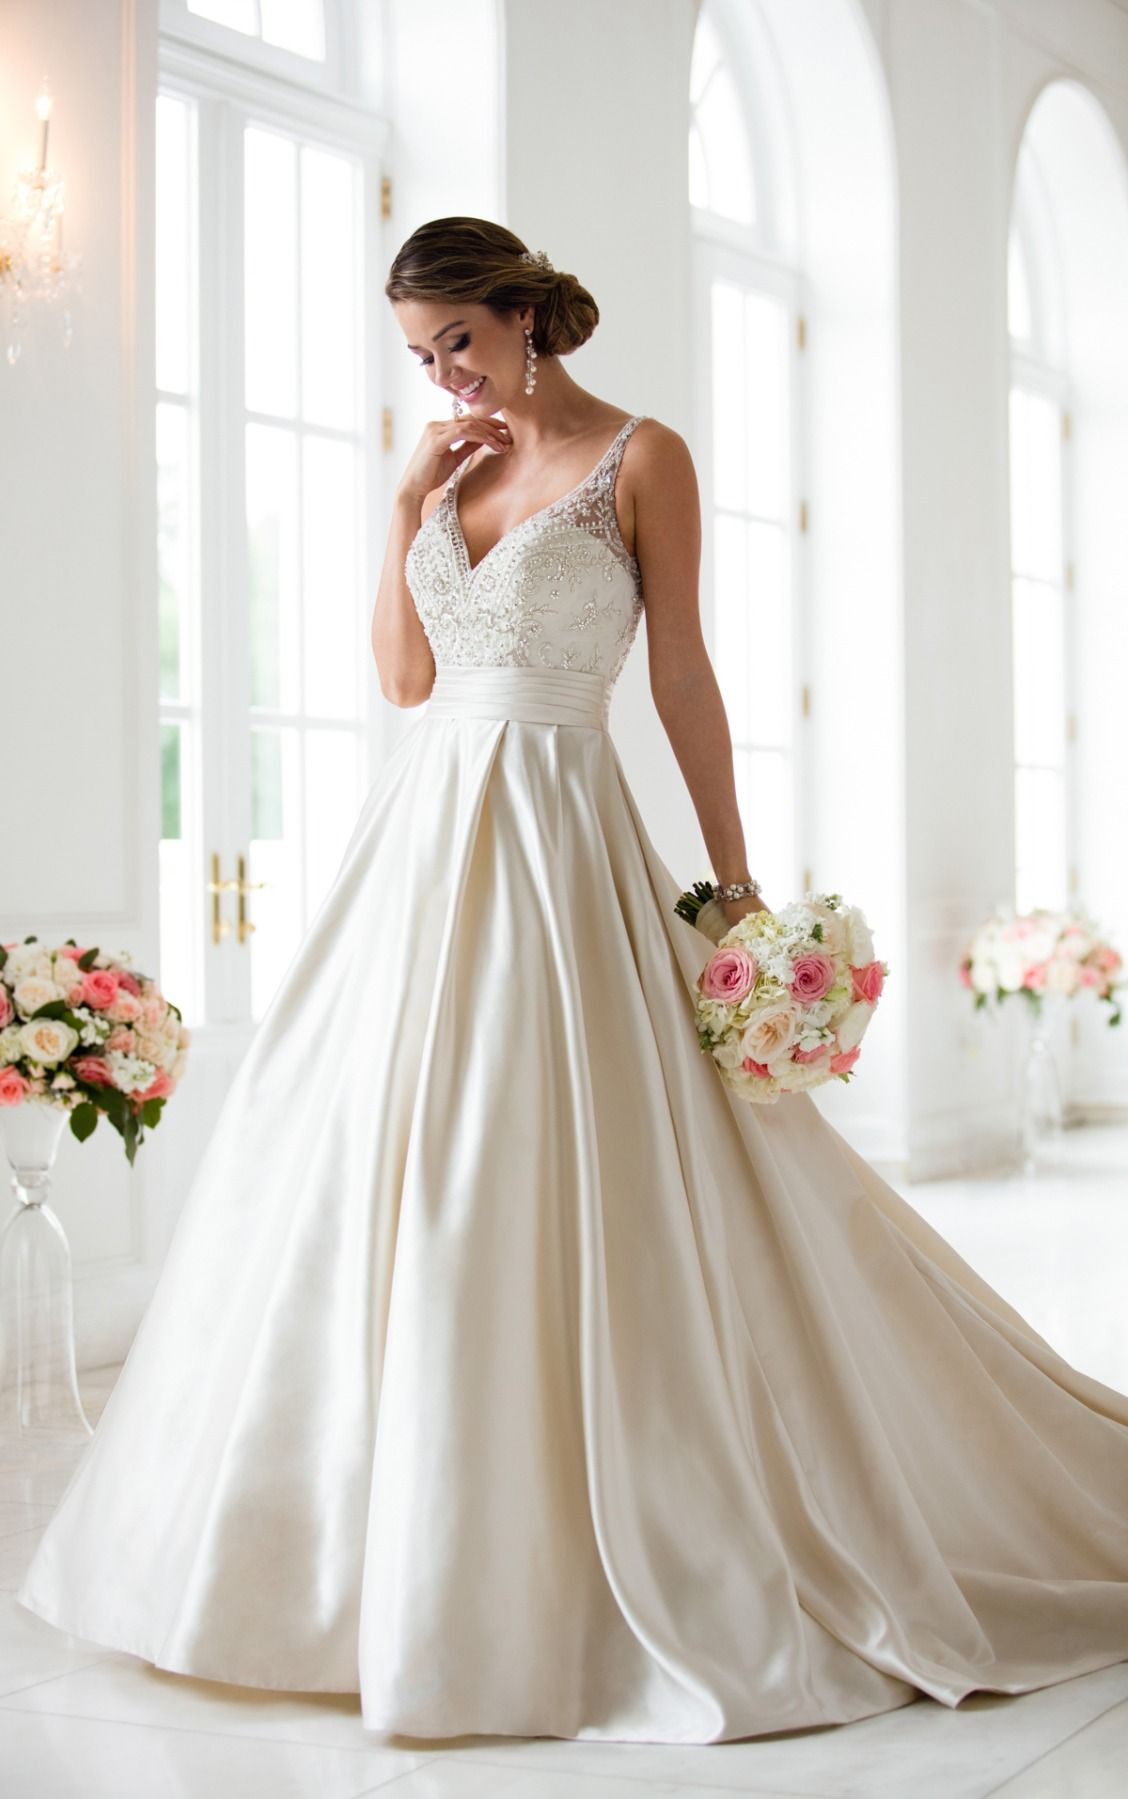 Wedding Dresses   What\'s Your Stella York Dream?   Pinterest   Satin ...